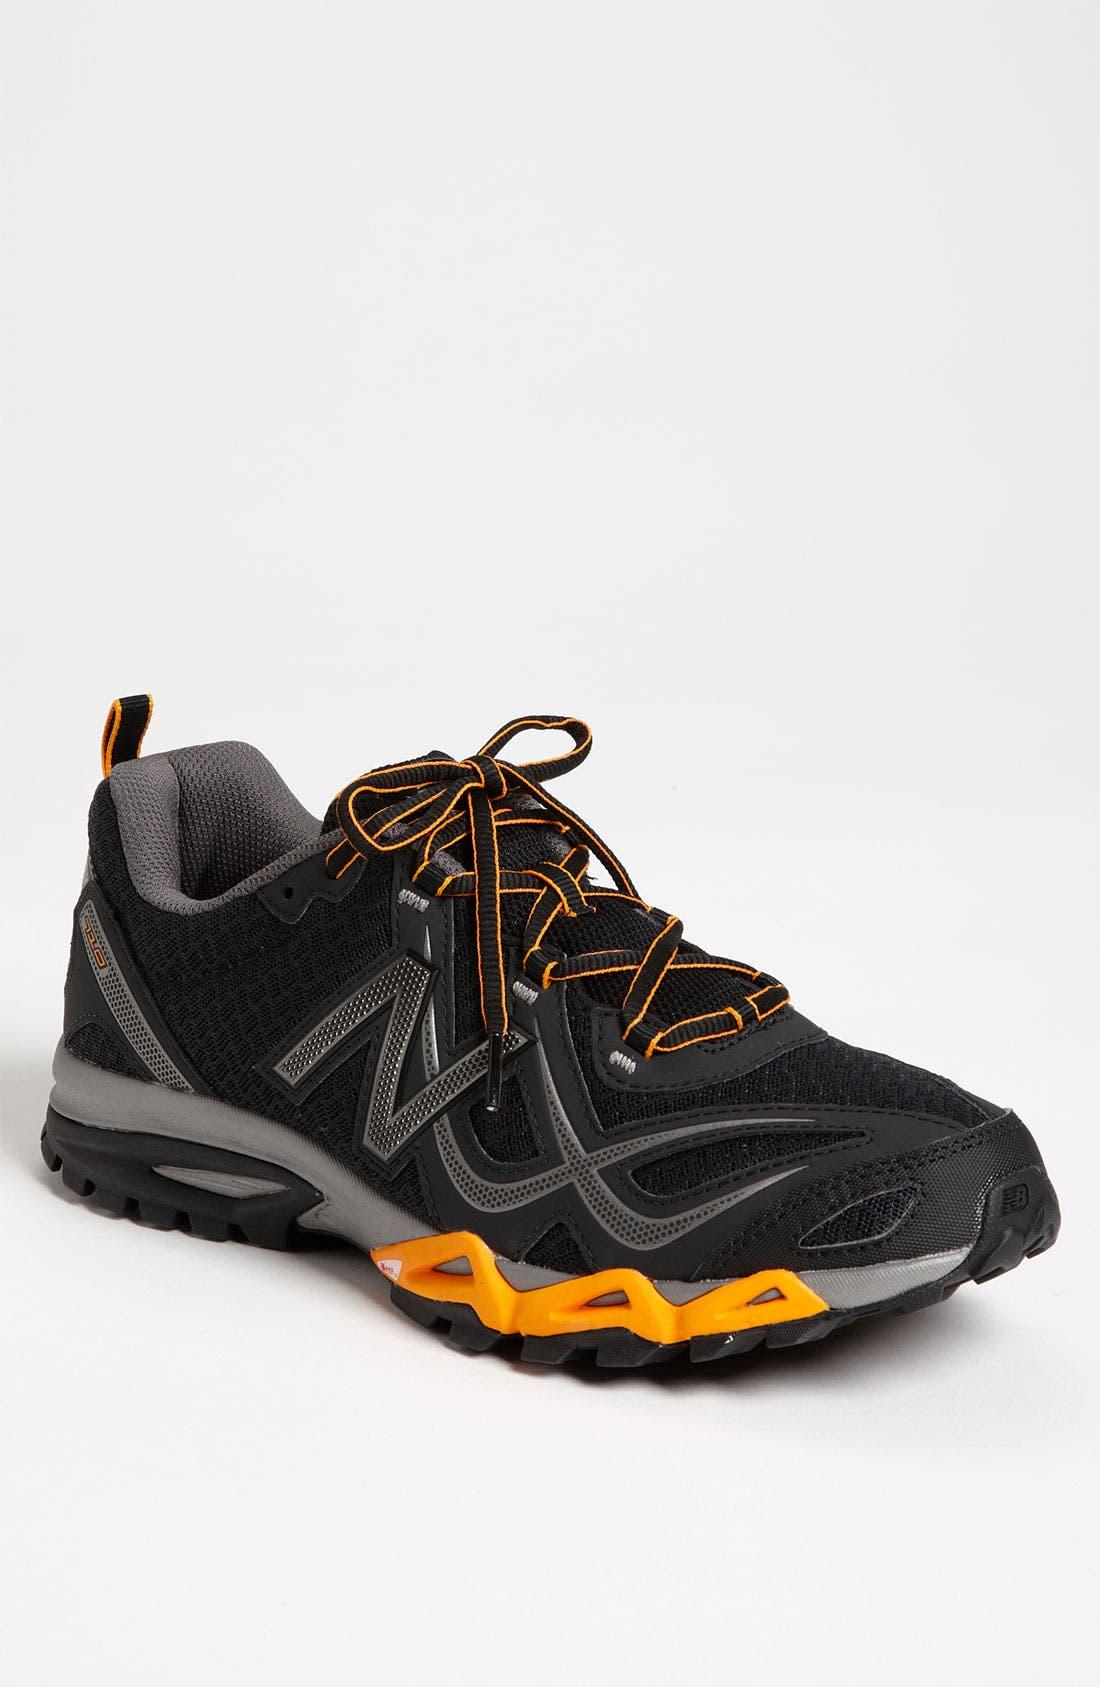 Main Image - New Balance '710' Trail Running Shoe (Men)